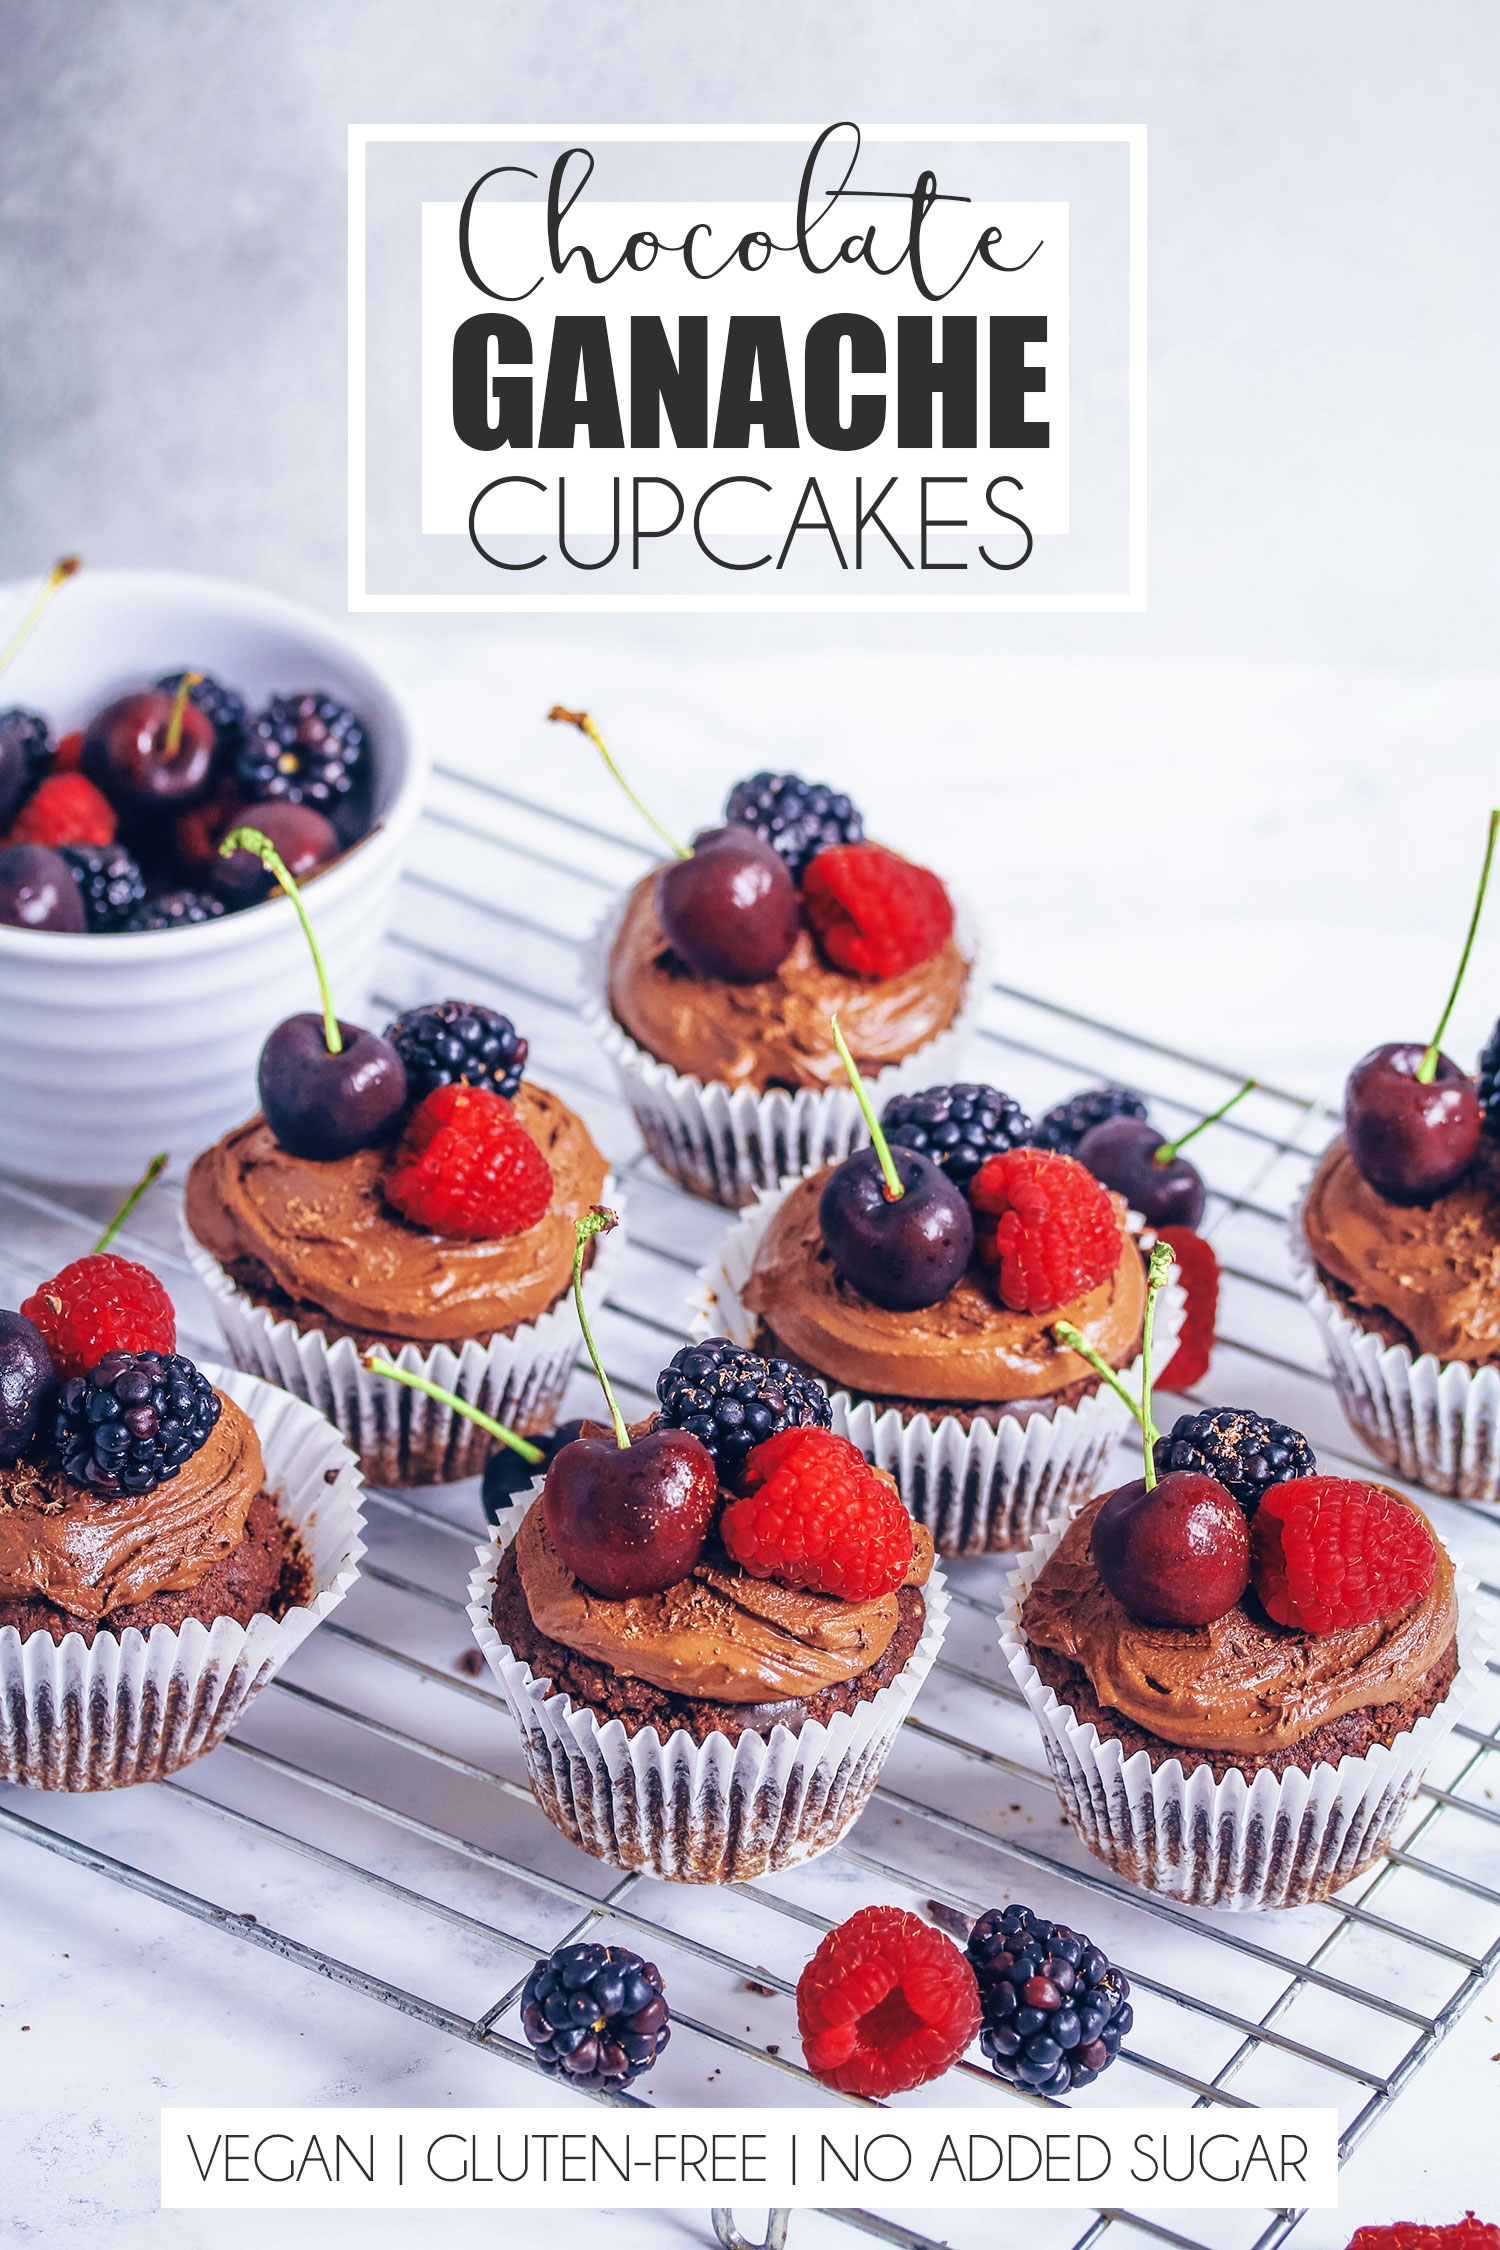 Chocolate Ganache Cupcakes (Vegan & Gluten-free)